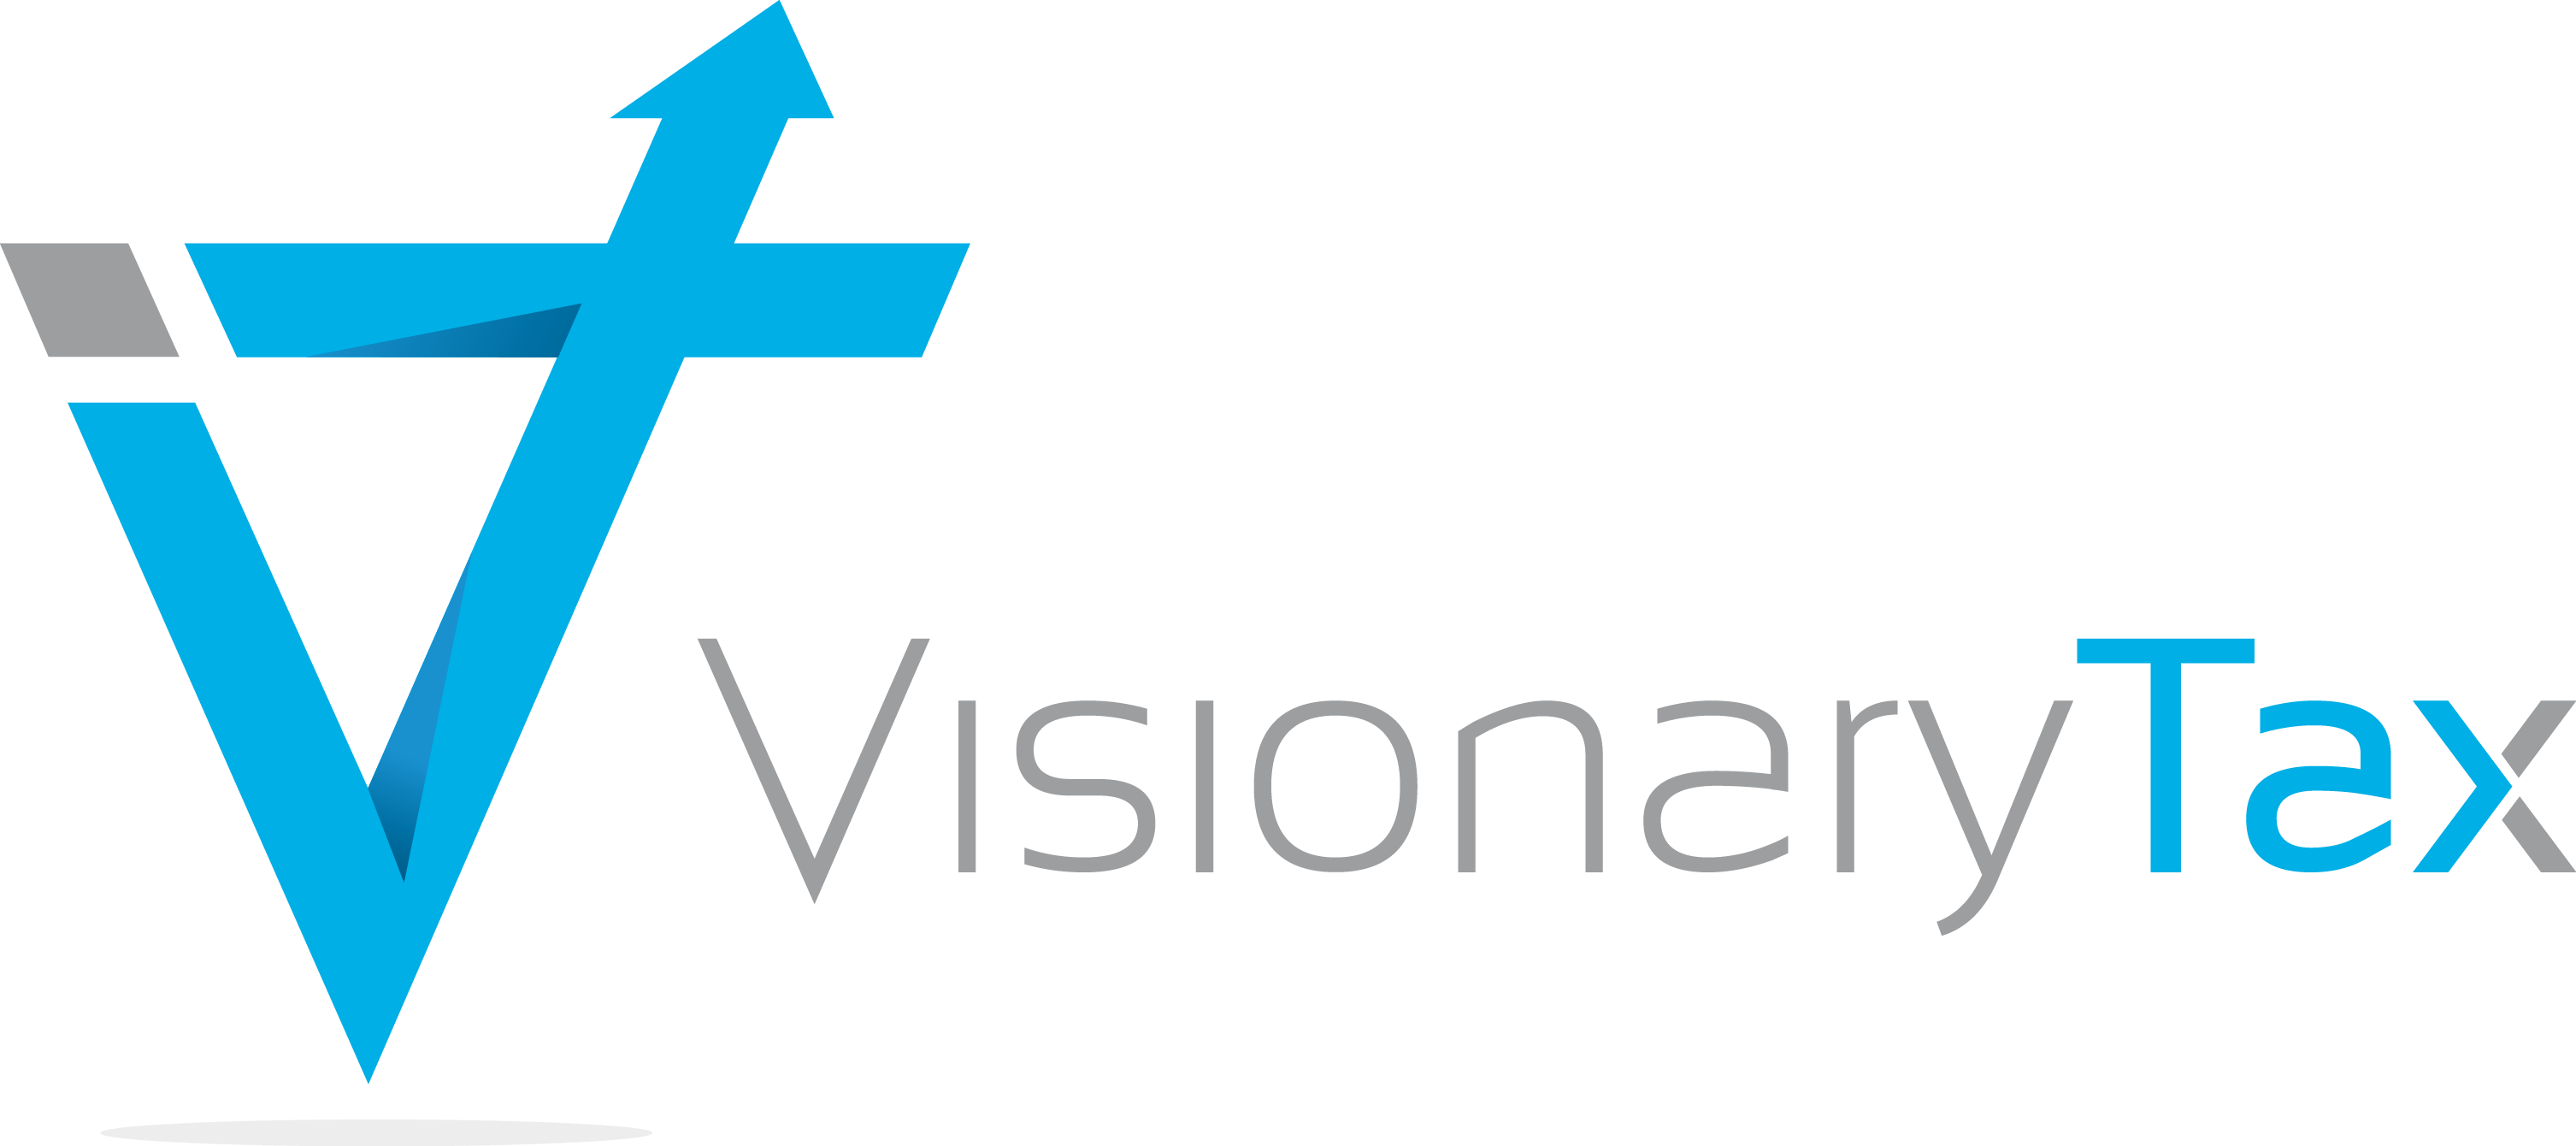 Visionary Tax